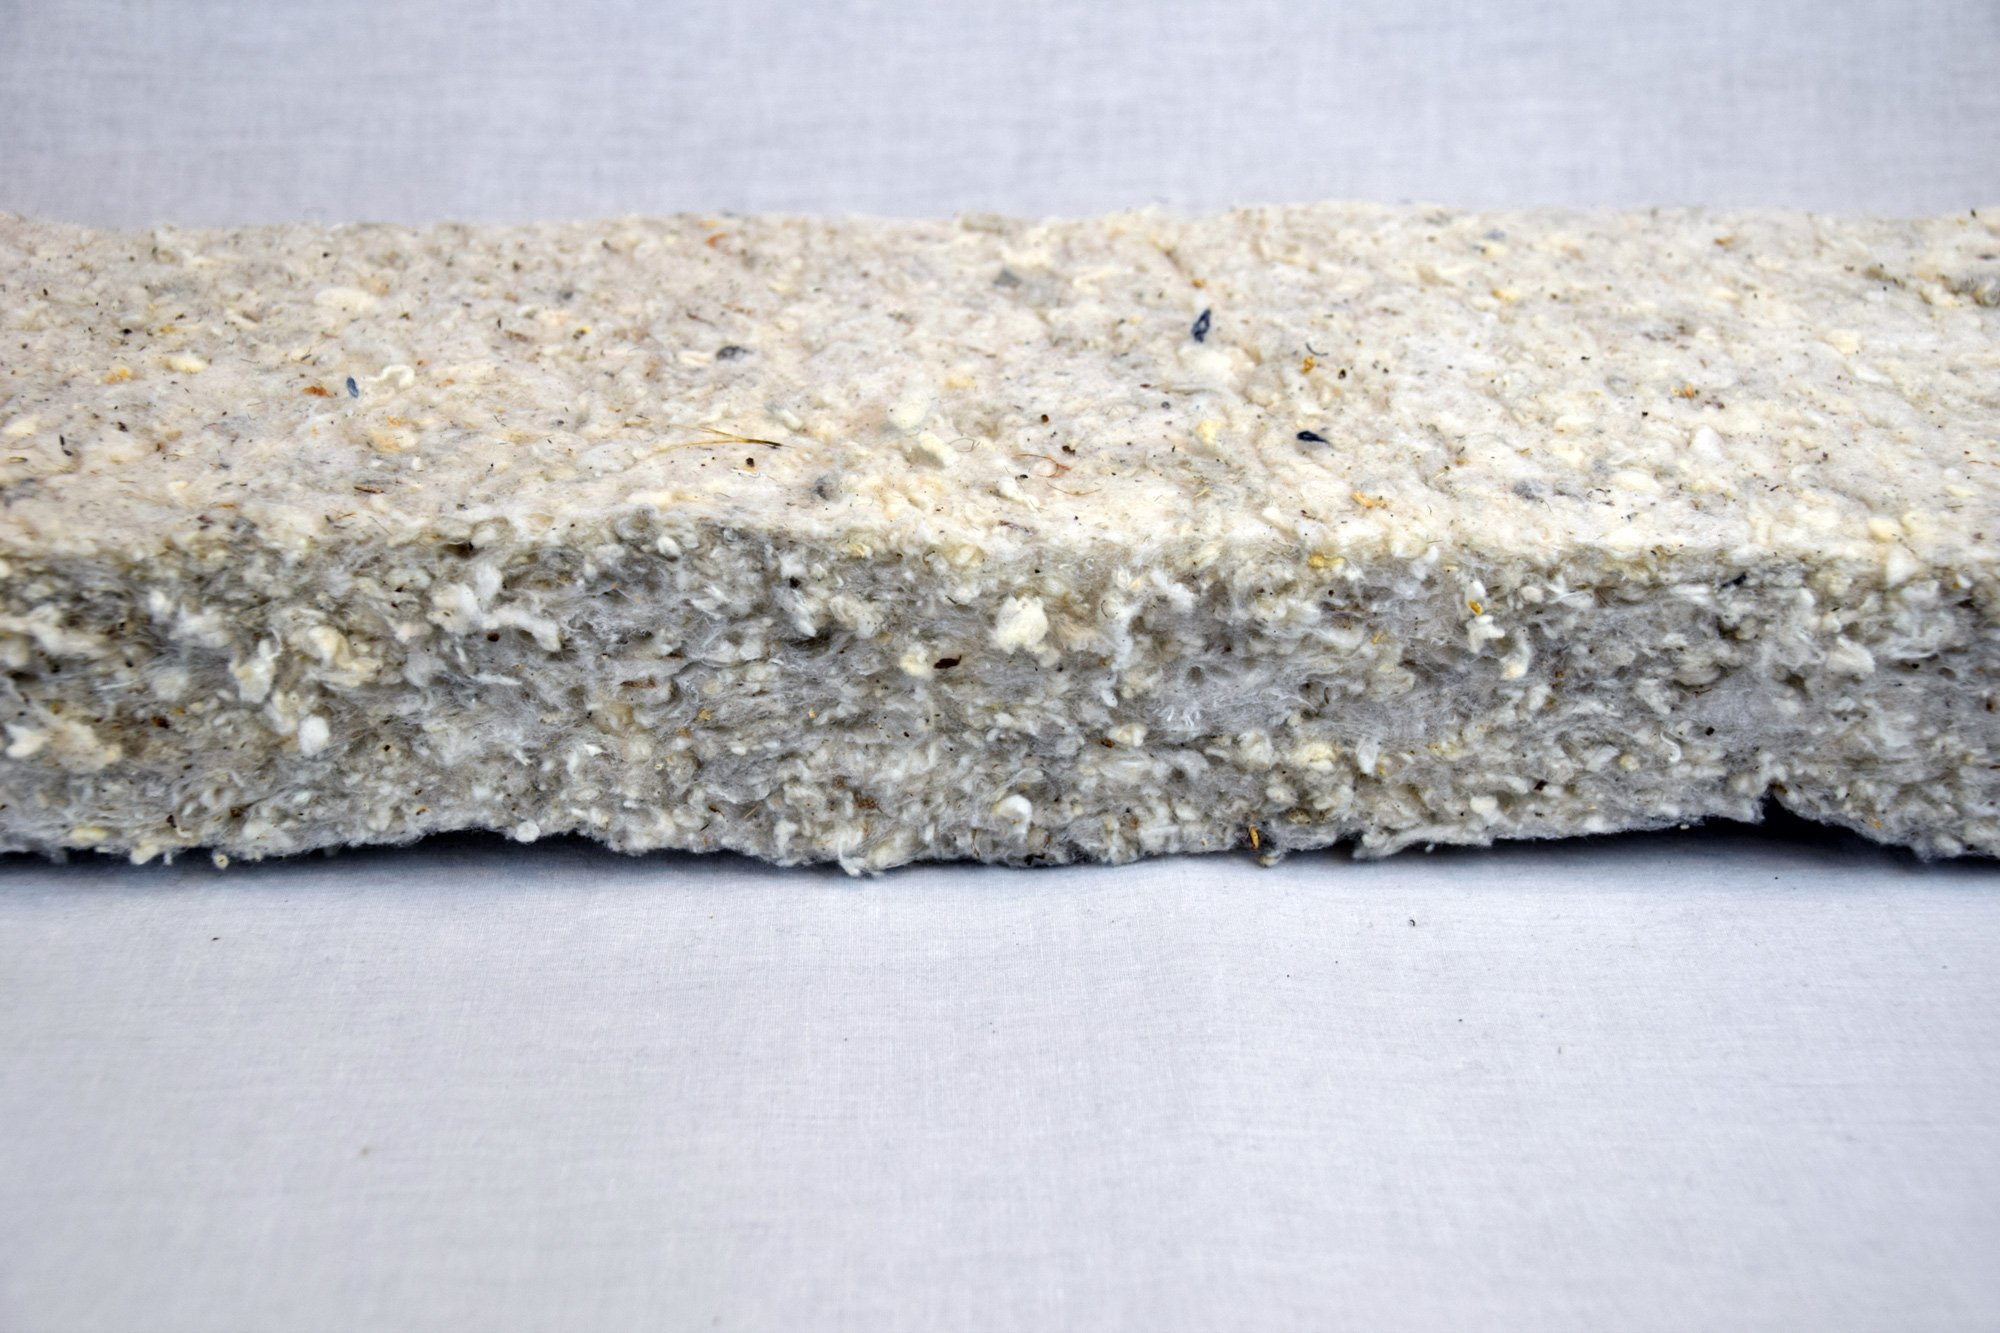 KODIAKOTTON insulated liner